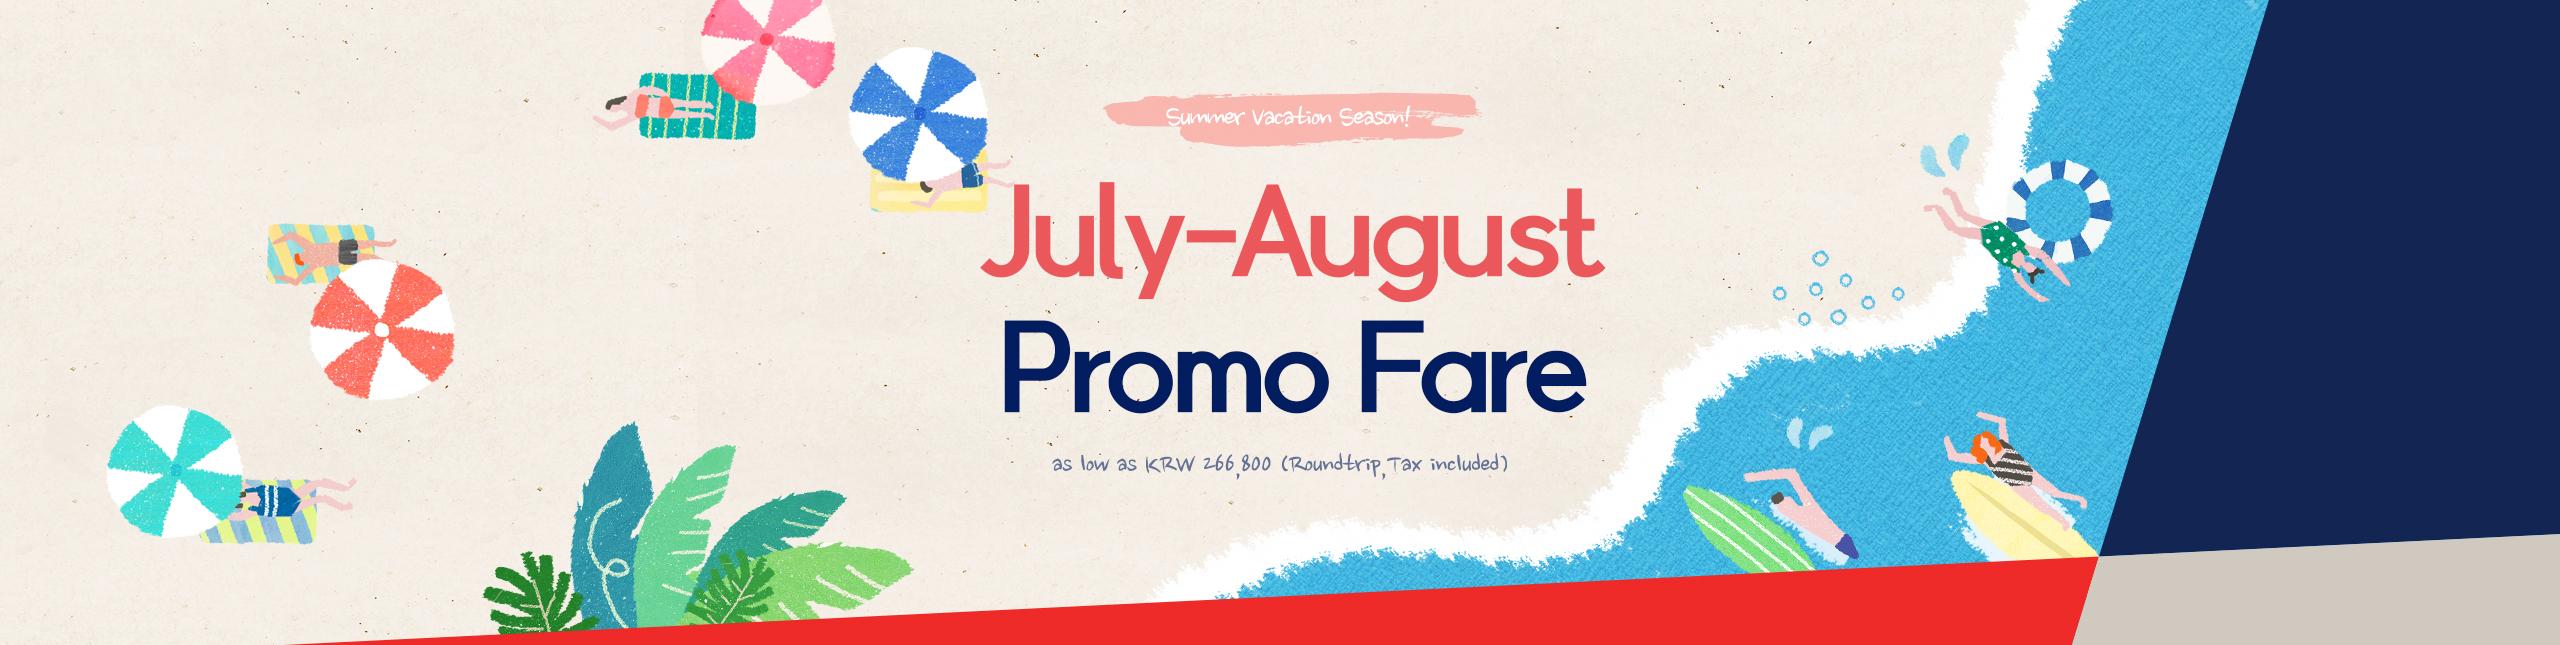 Summer Vacation Season Promo Fare